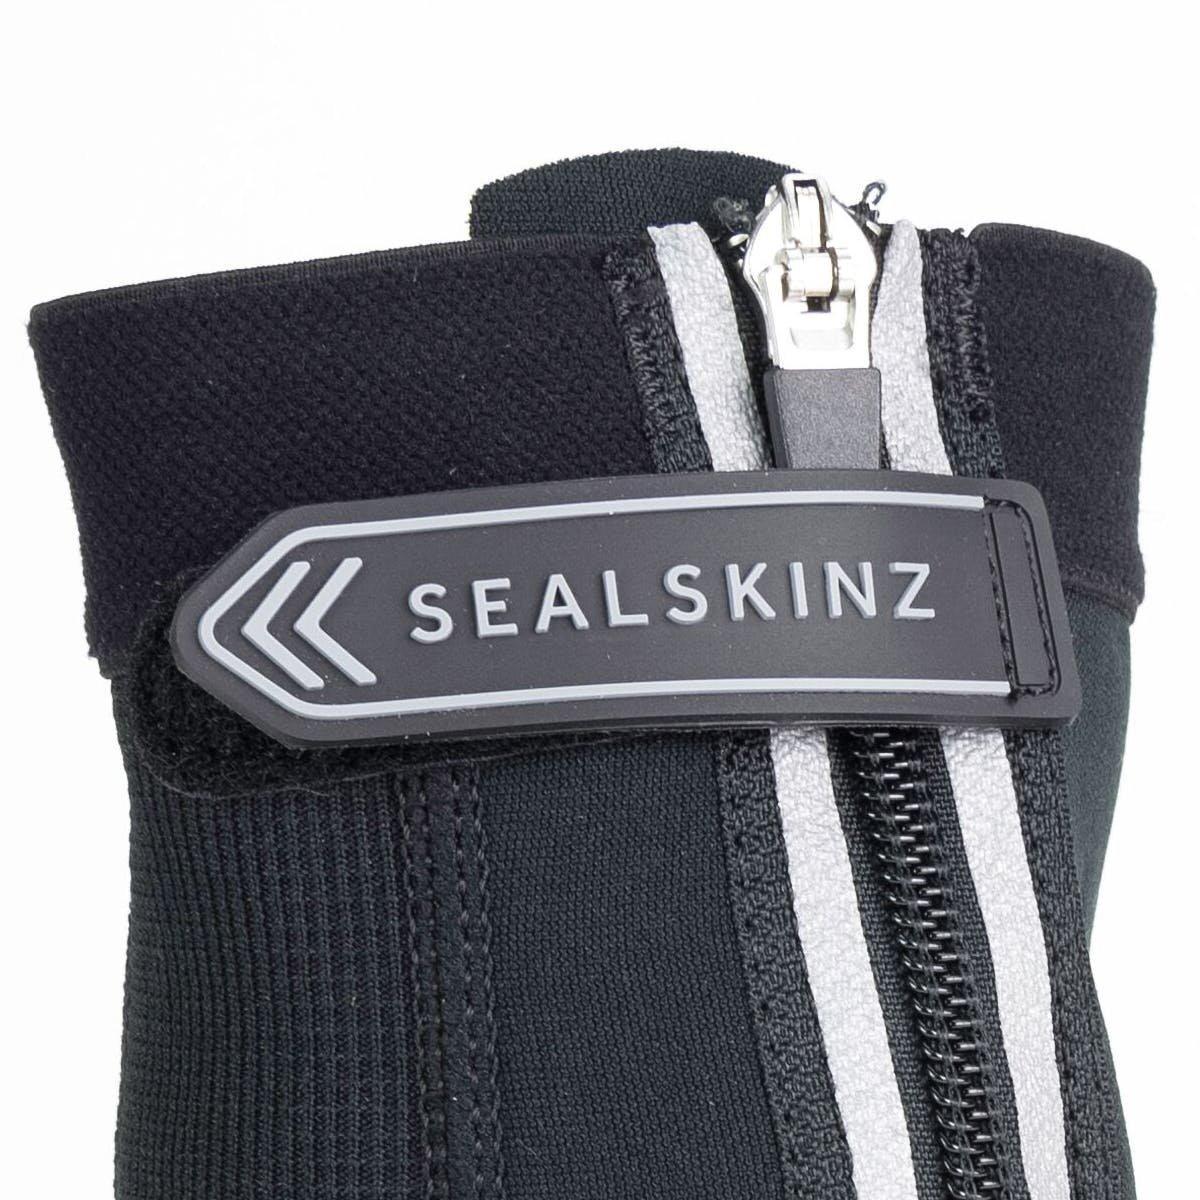 Sealskinz All Weather LED Overshoe